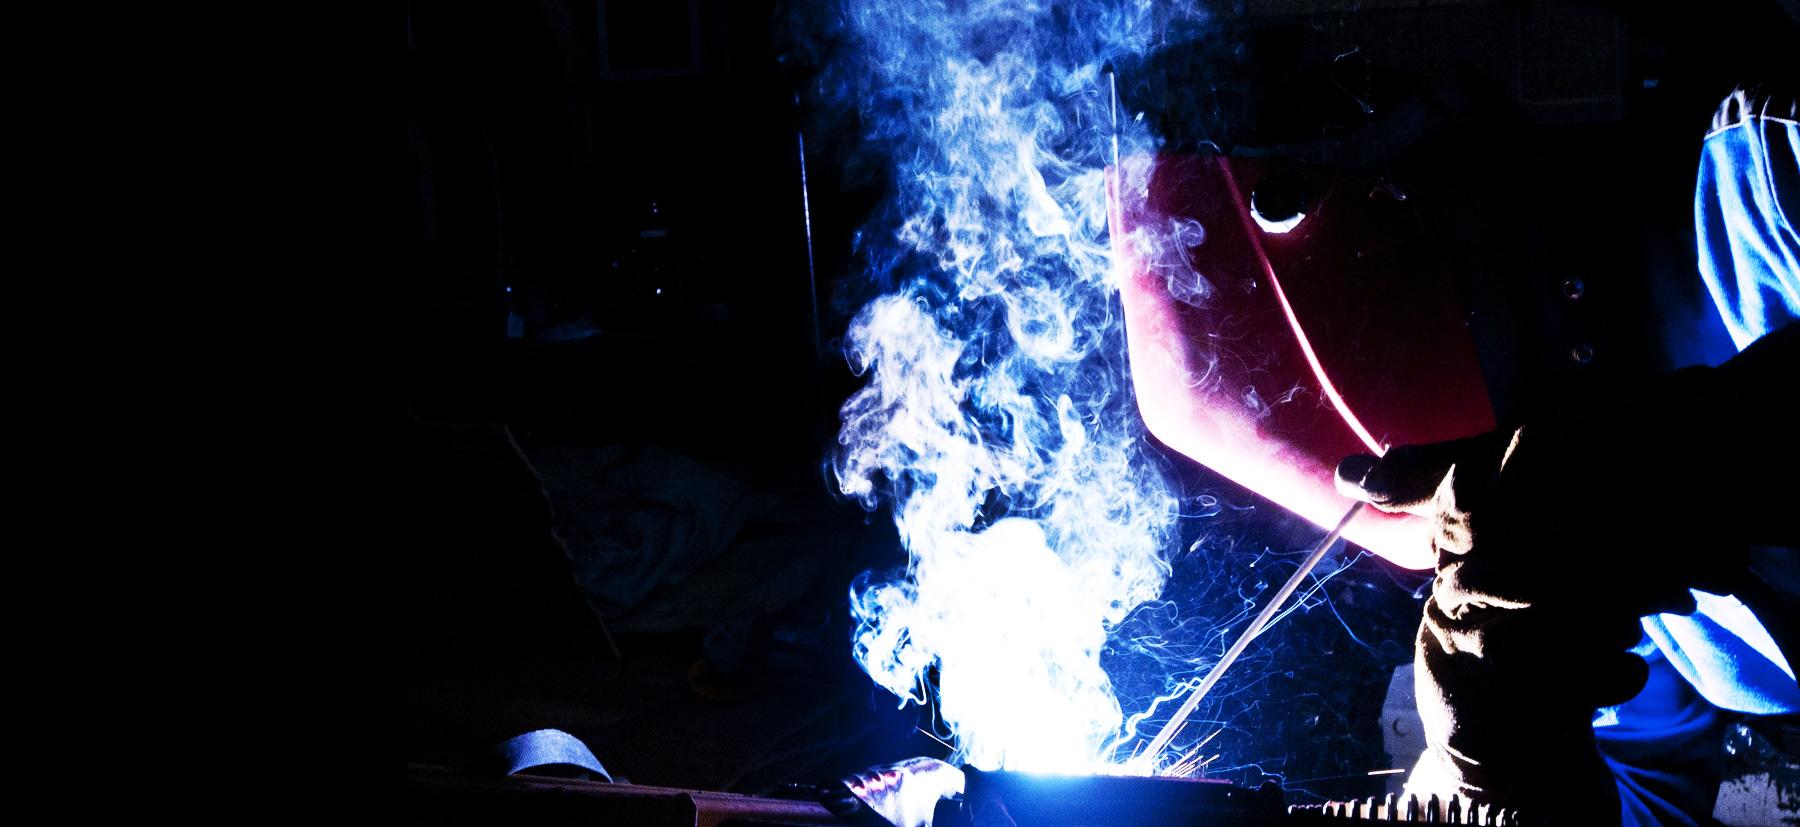 Professional Welding Services - Slider Image 1